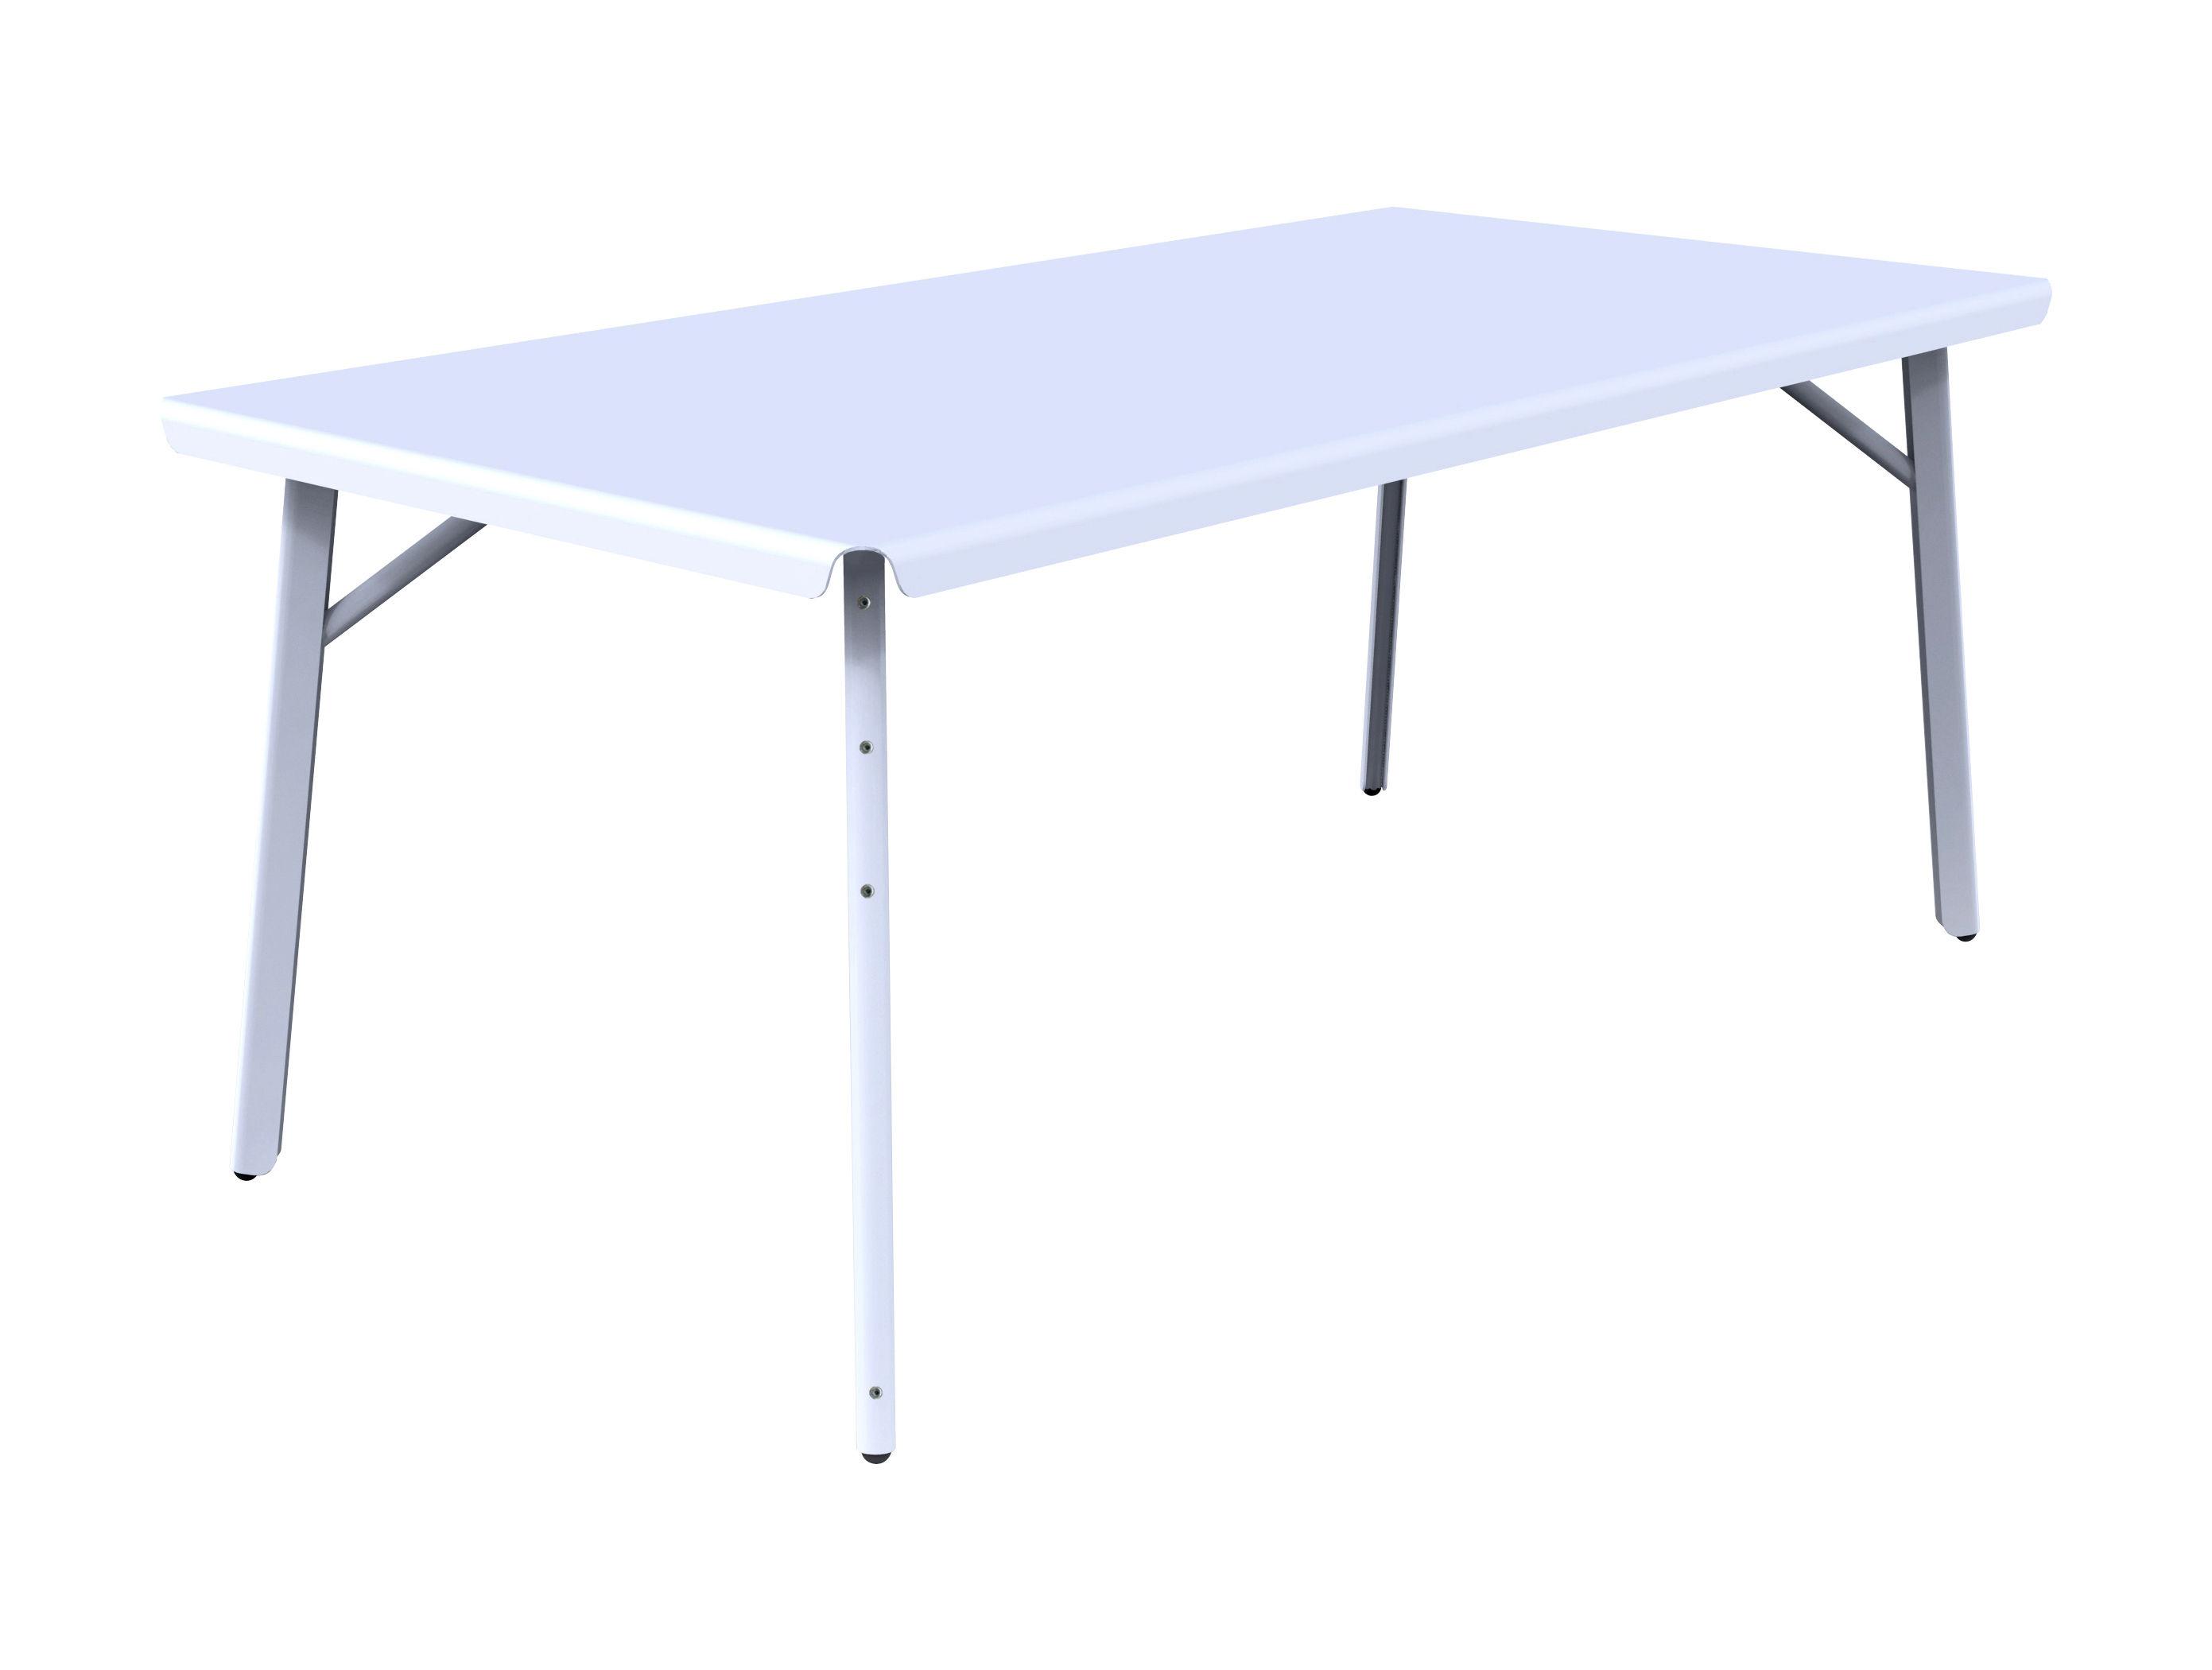 Jardin - Tables de jardin - Table rectangulaire Dakar / 180 x 90 cm - Skitsch - L 180 cm - Blanc - Acier, Aluminium